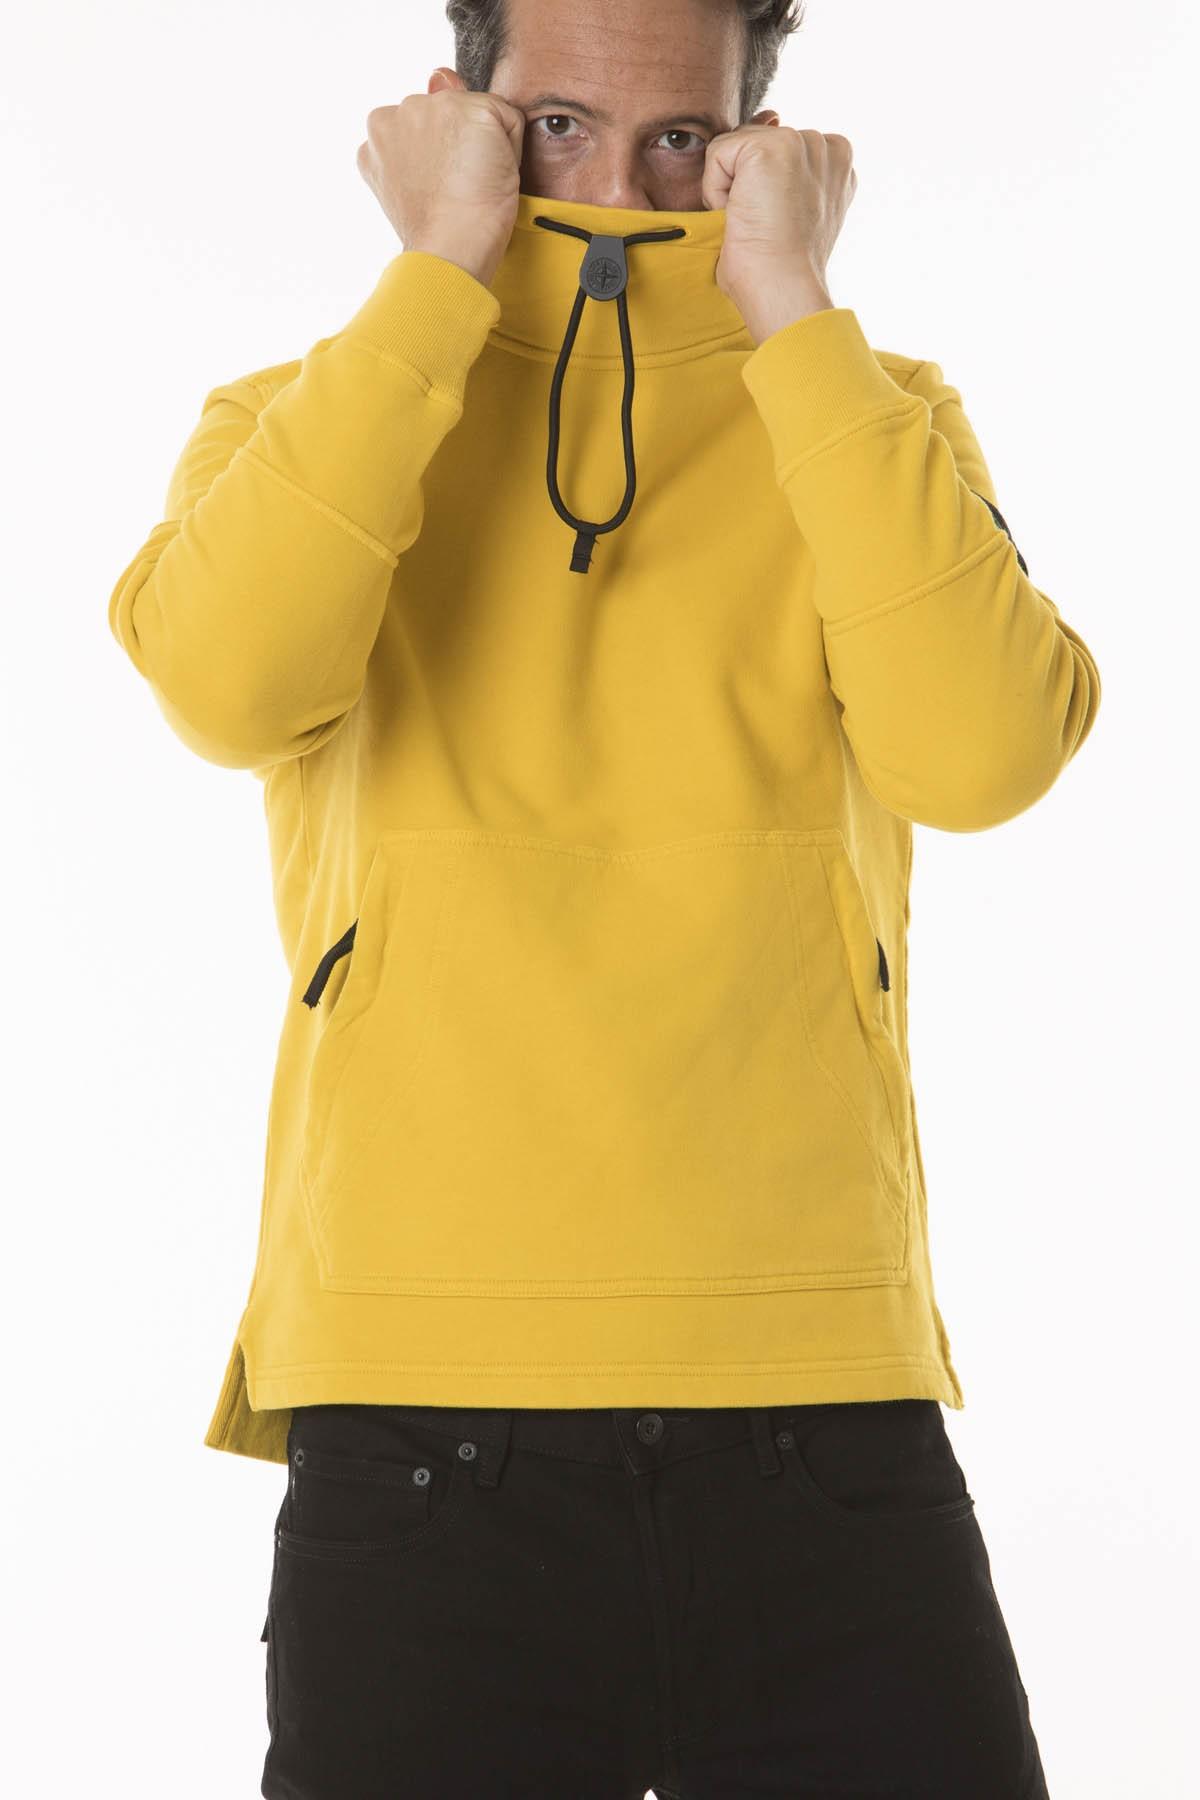 0699287d855a Sweatshirt for man STONE ISLAND F W 18-19 - Rione Fontana